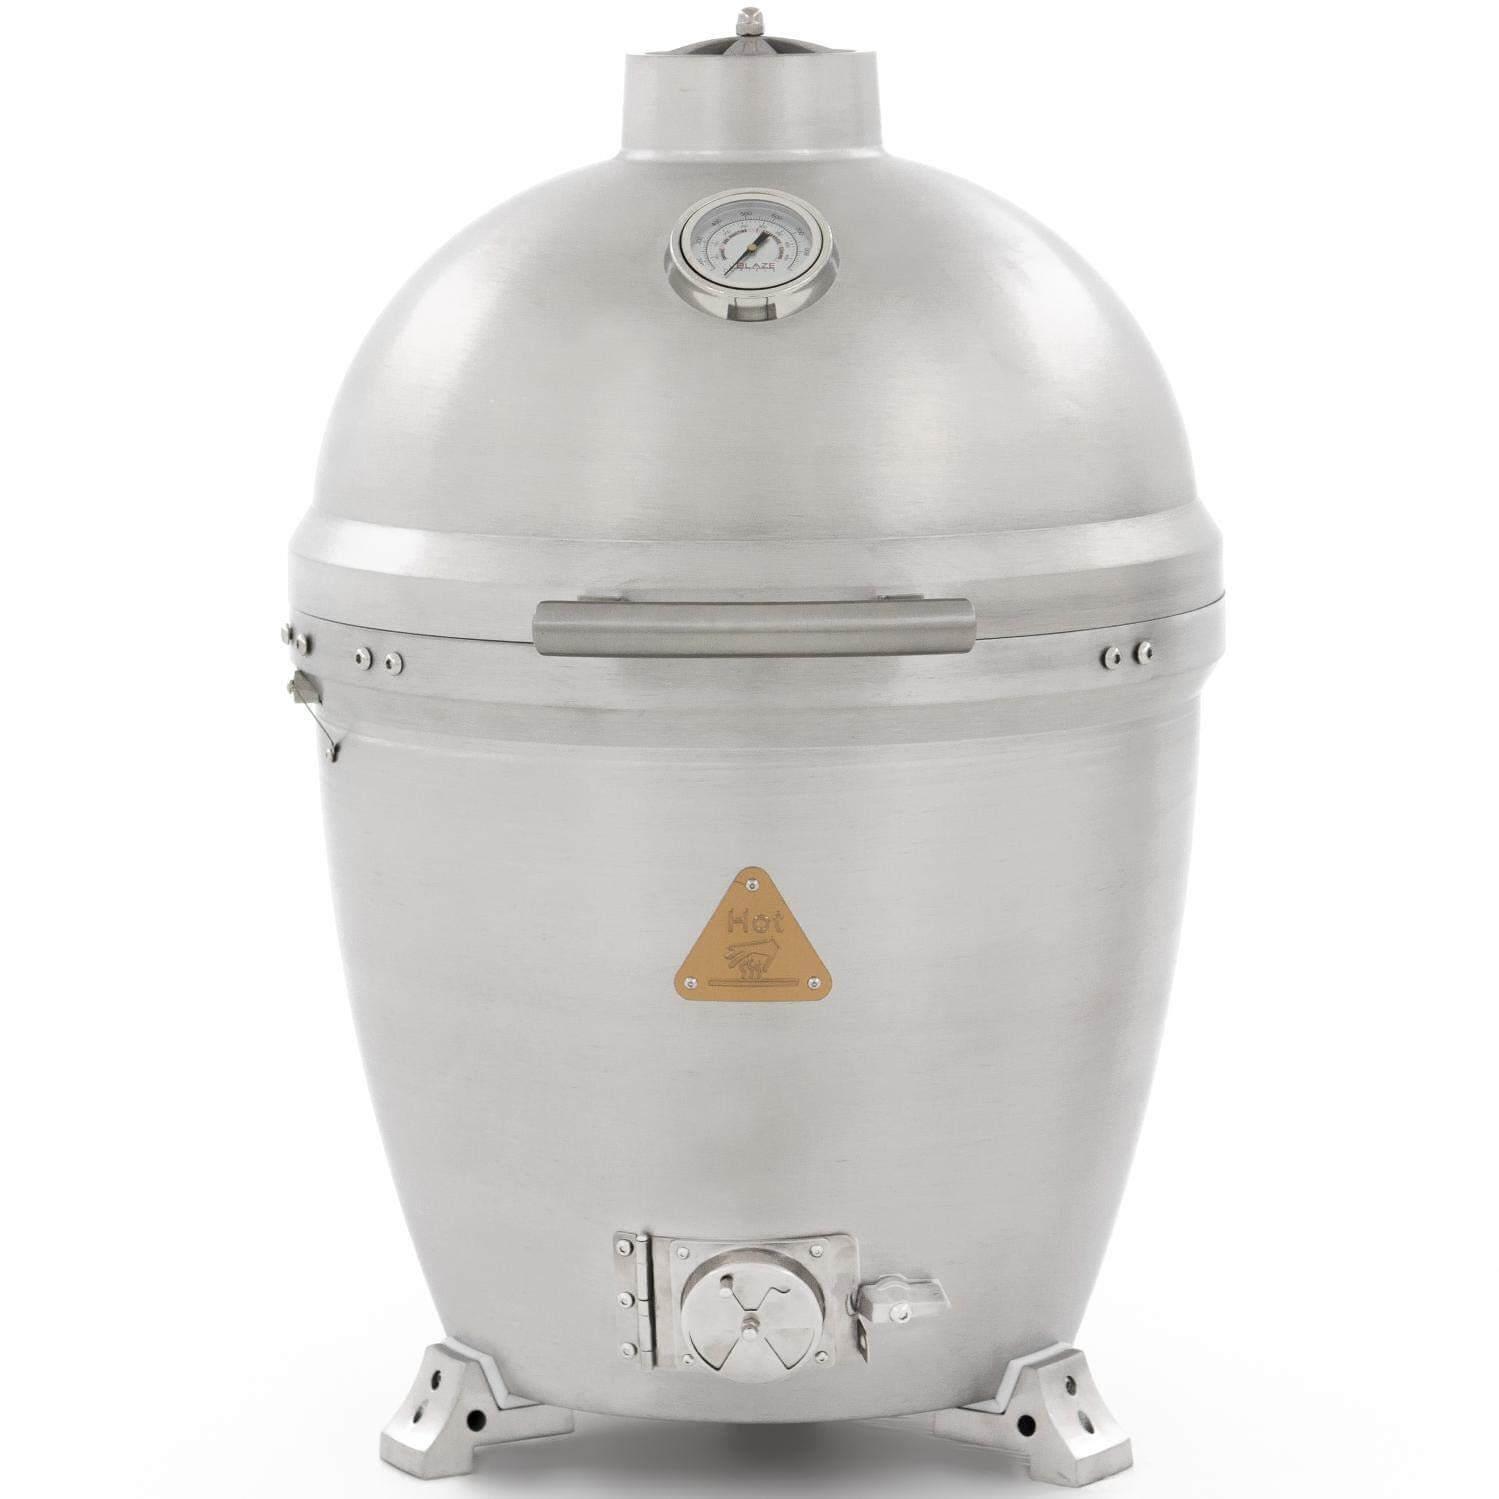 Blaze Cast Aluminum Kamado Grill, BLZ-20-KAMADO